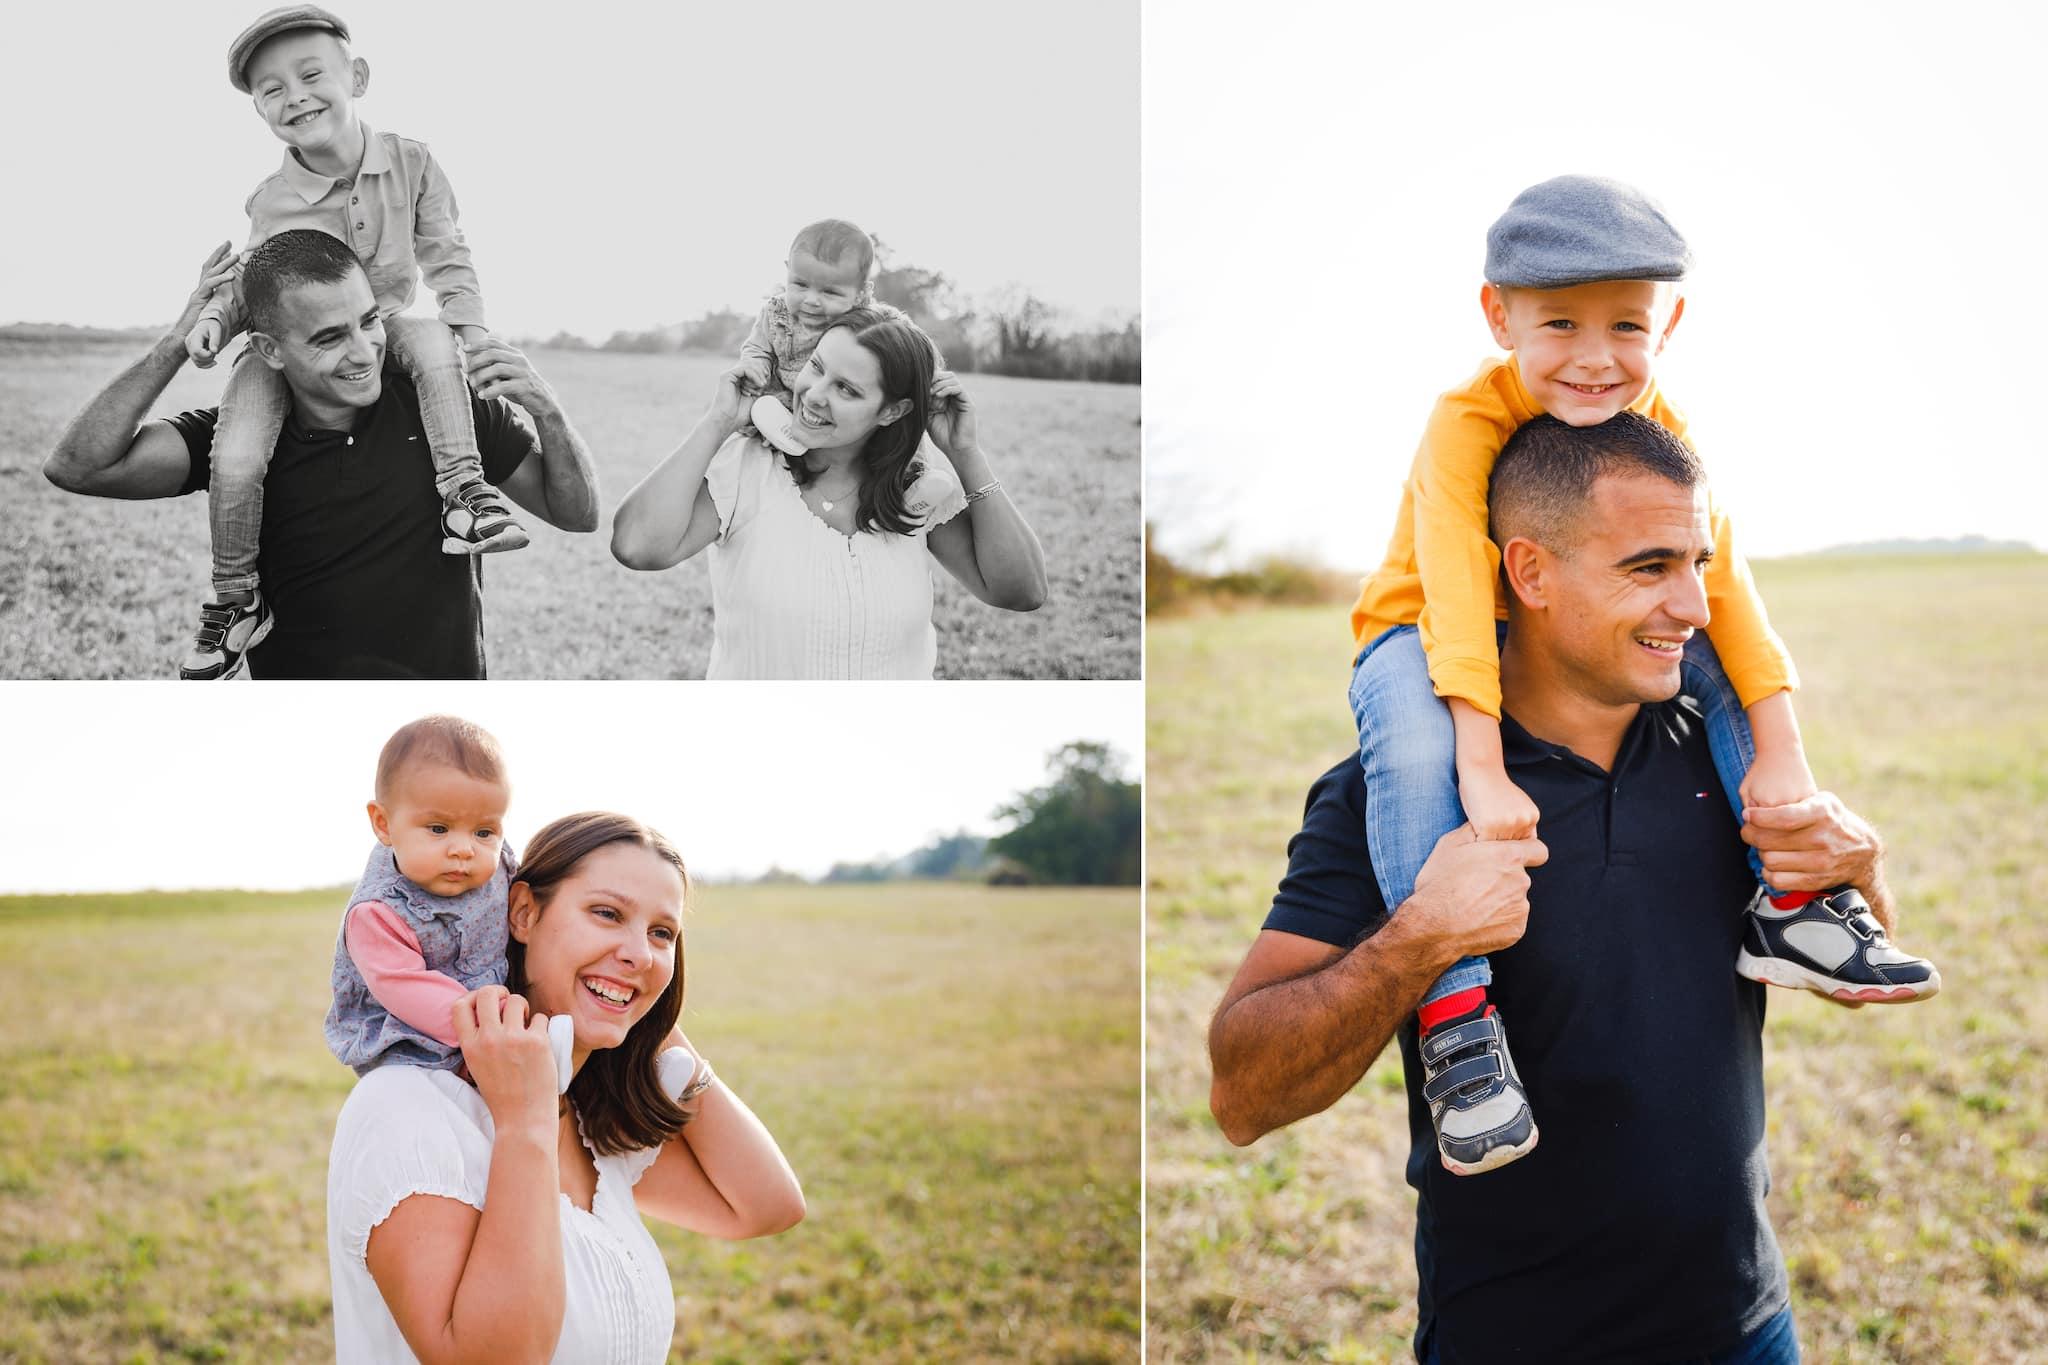 photographe de famille ; photographe de mariage